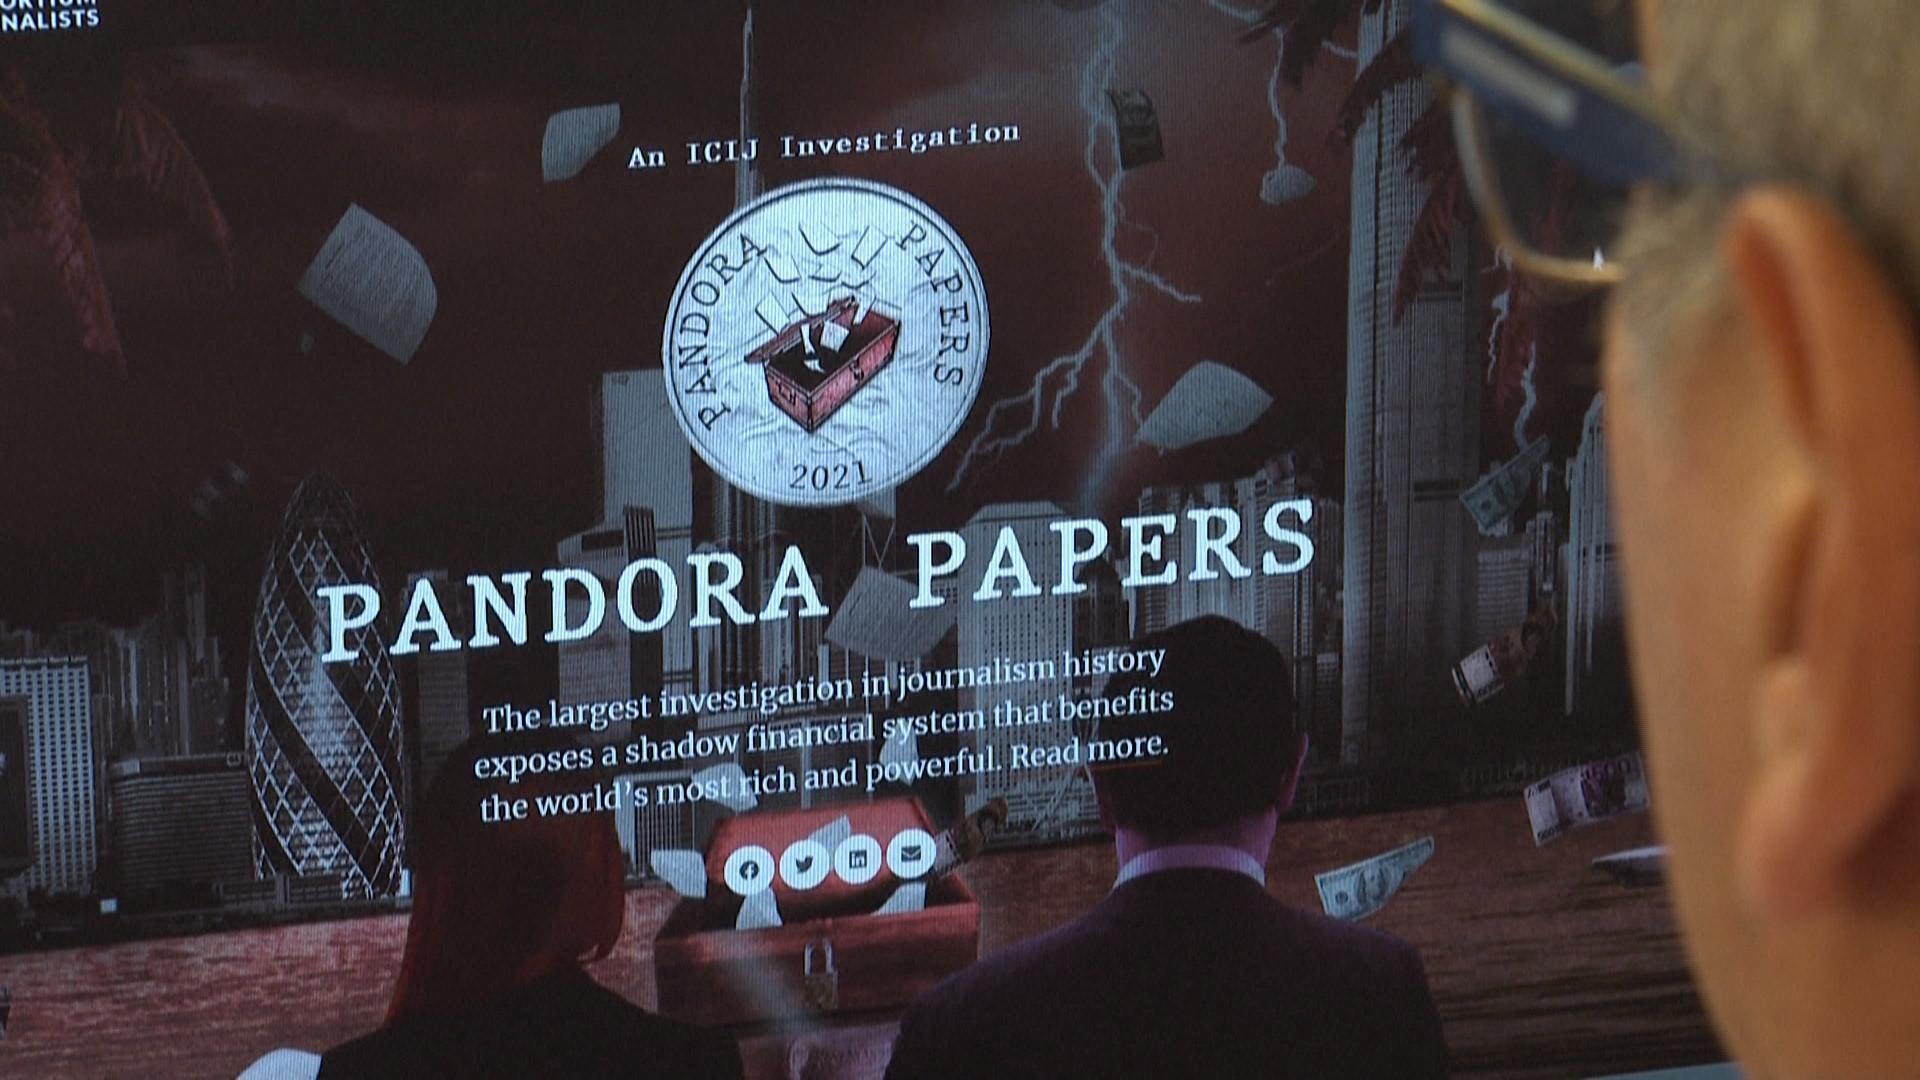 ECO PANDORA PAPERS 0410